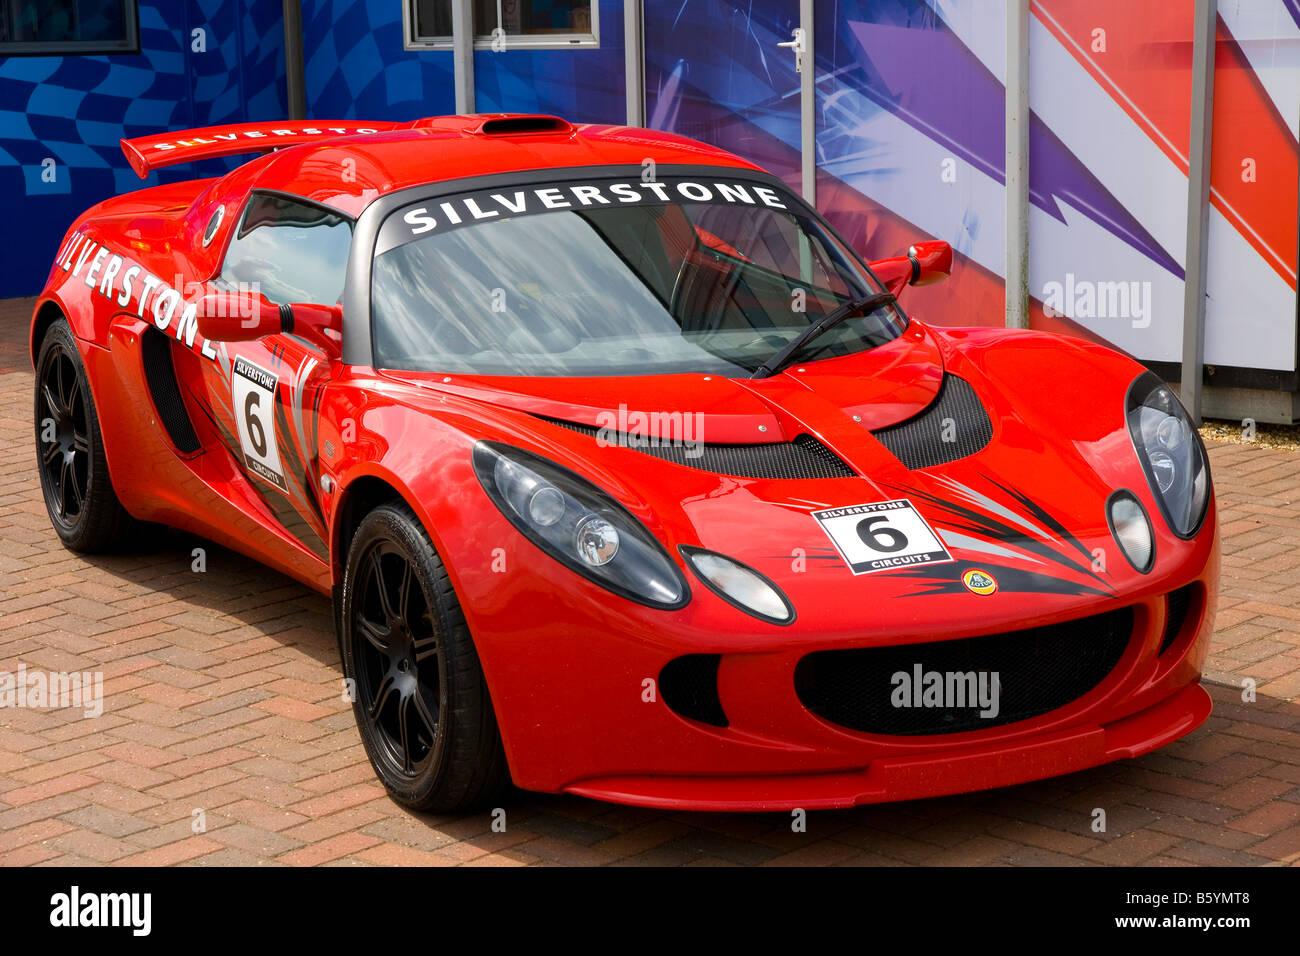 Lotus Elise at Silverstone Race Track - Stock Image